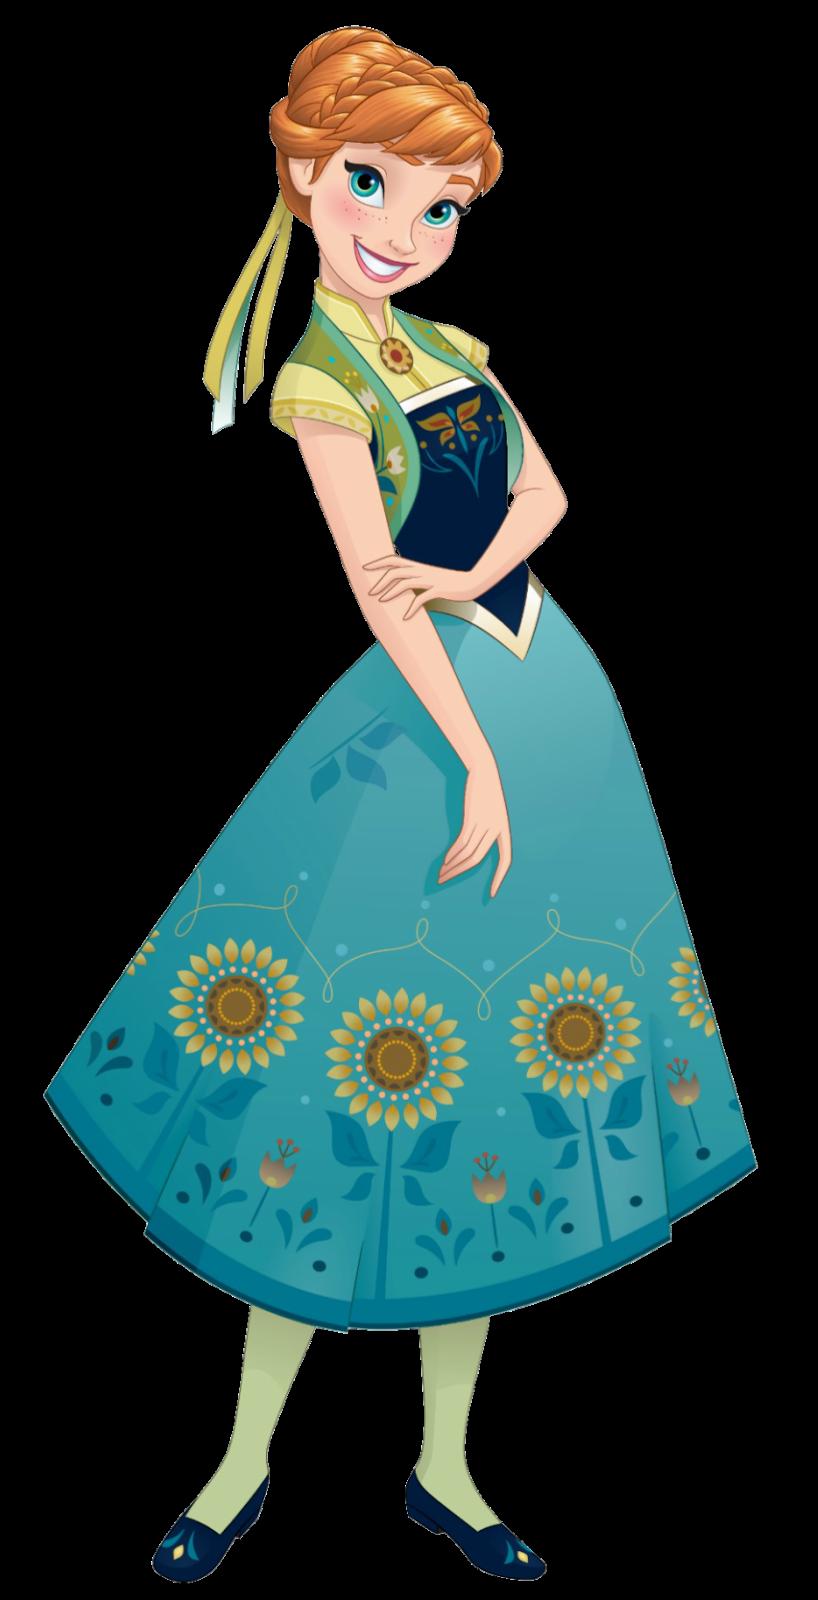 Anna Elsa Frozen Fever Olaf Kristoff.